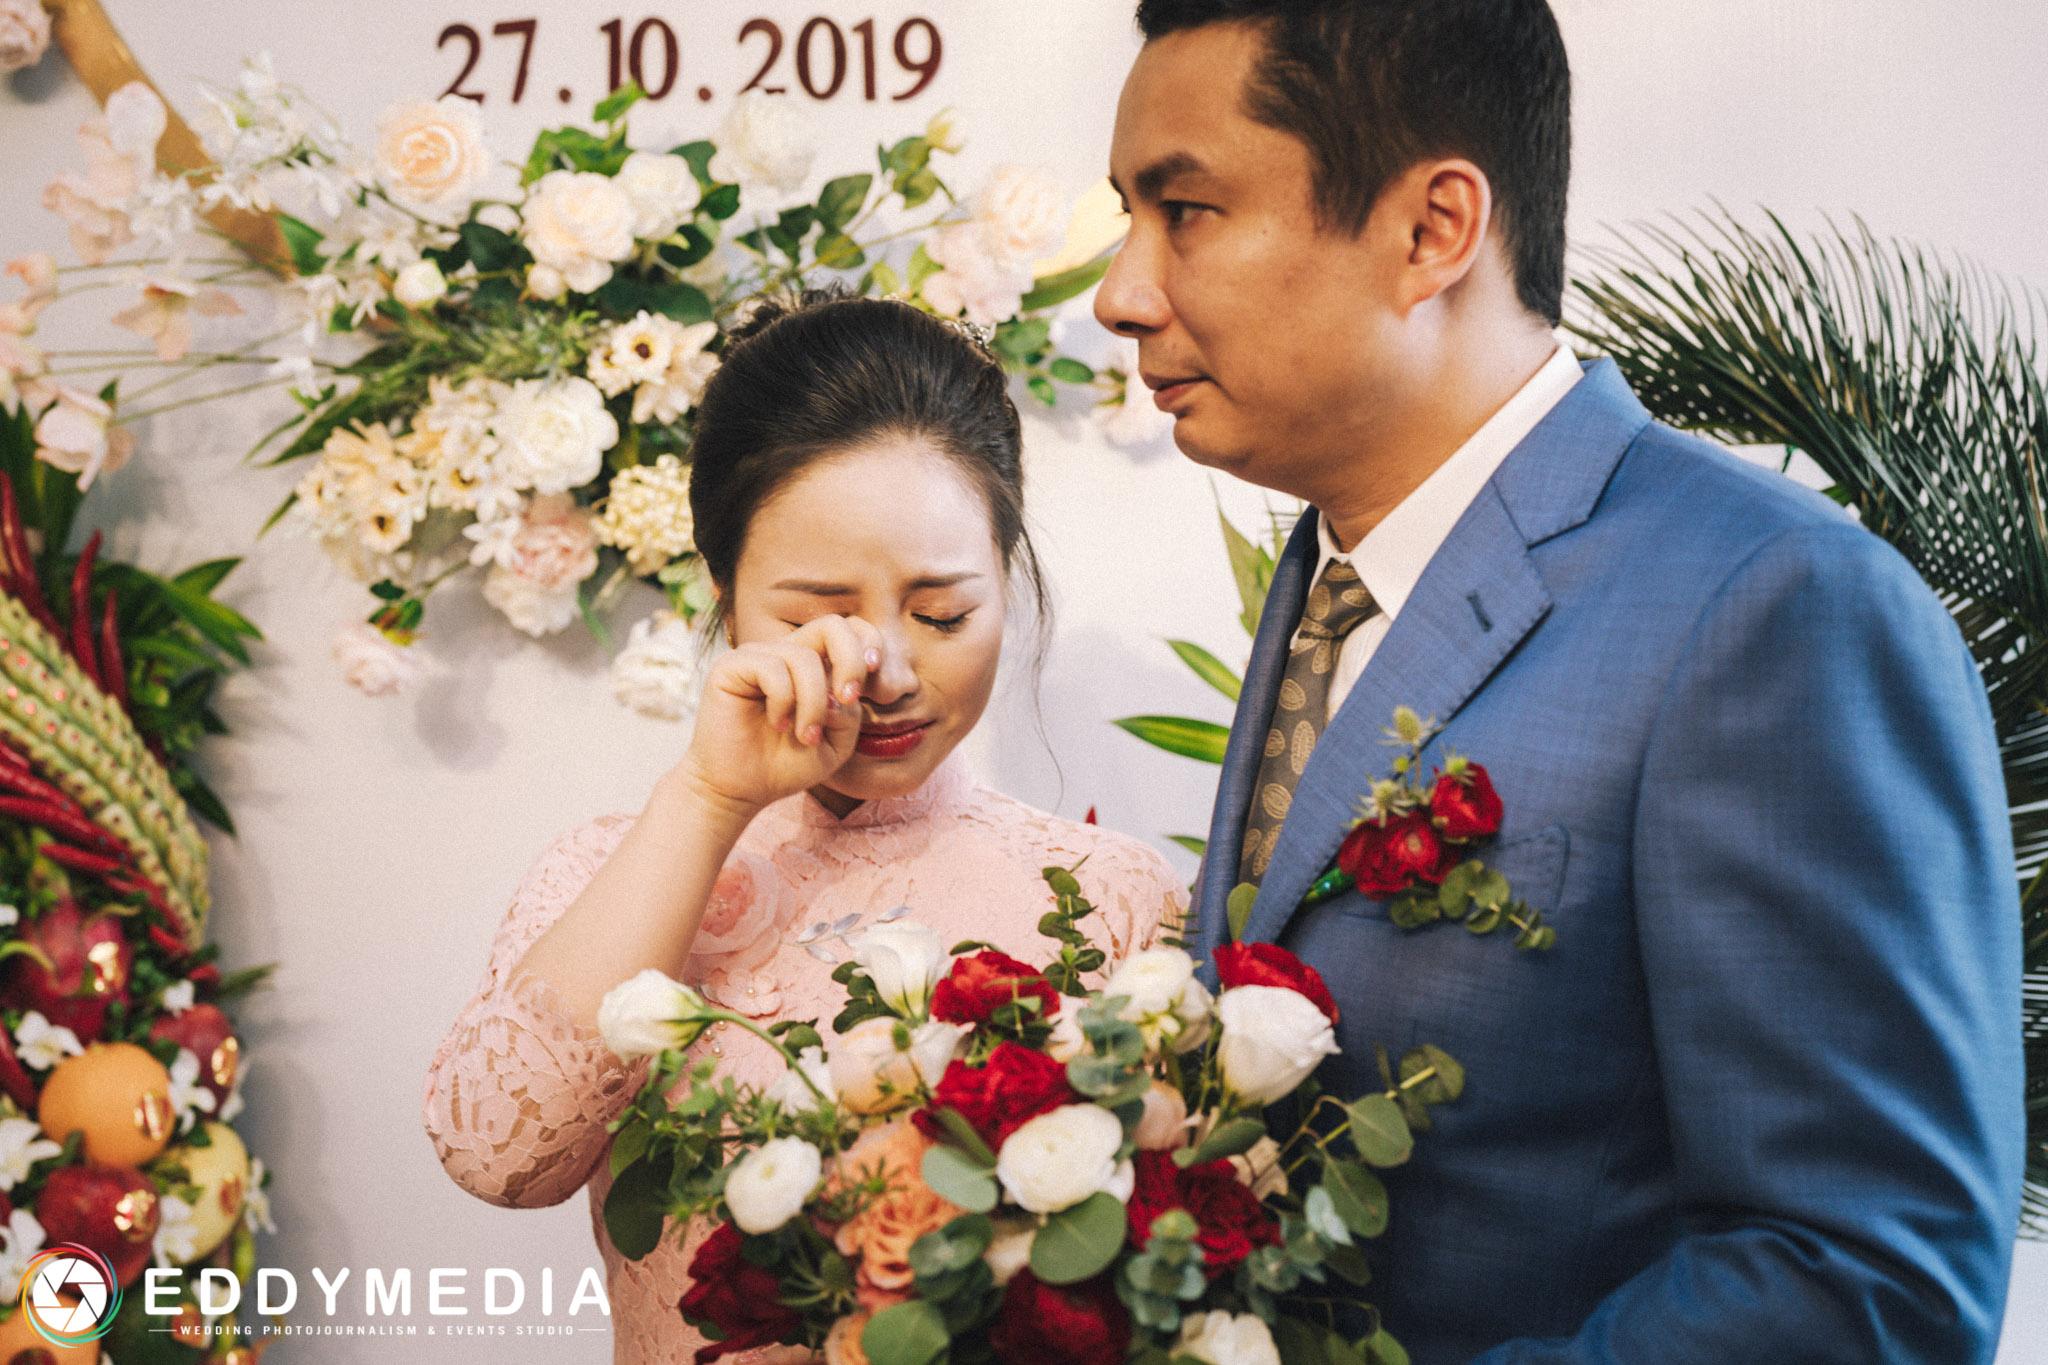 Phongsucuoi Melia Yenson Thule EddyMedia 62 lấy vợ bằng tuổi